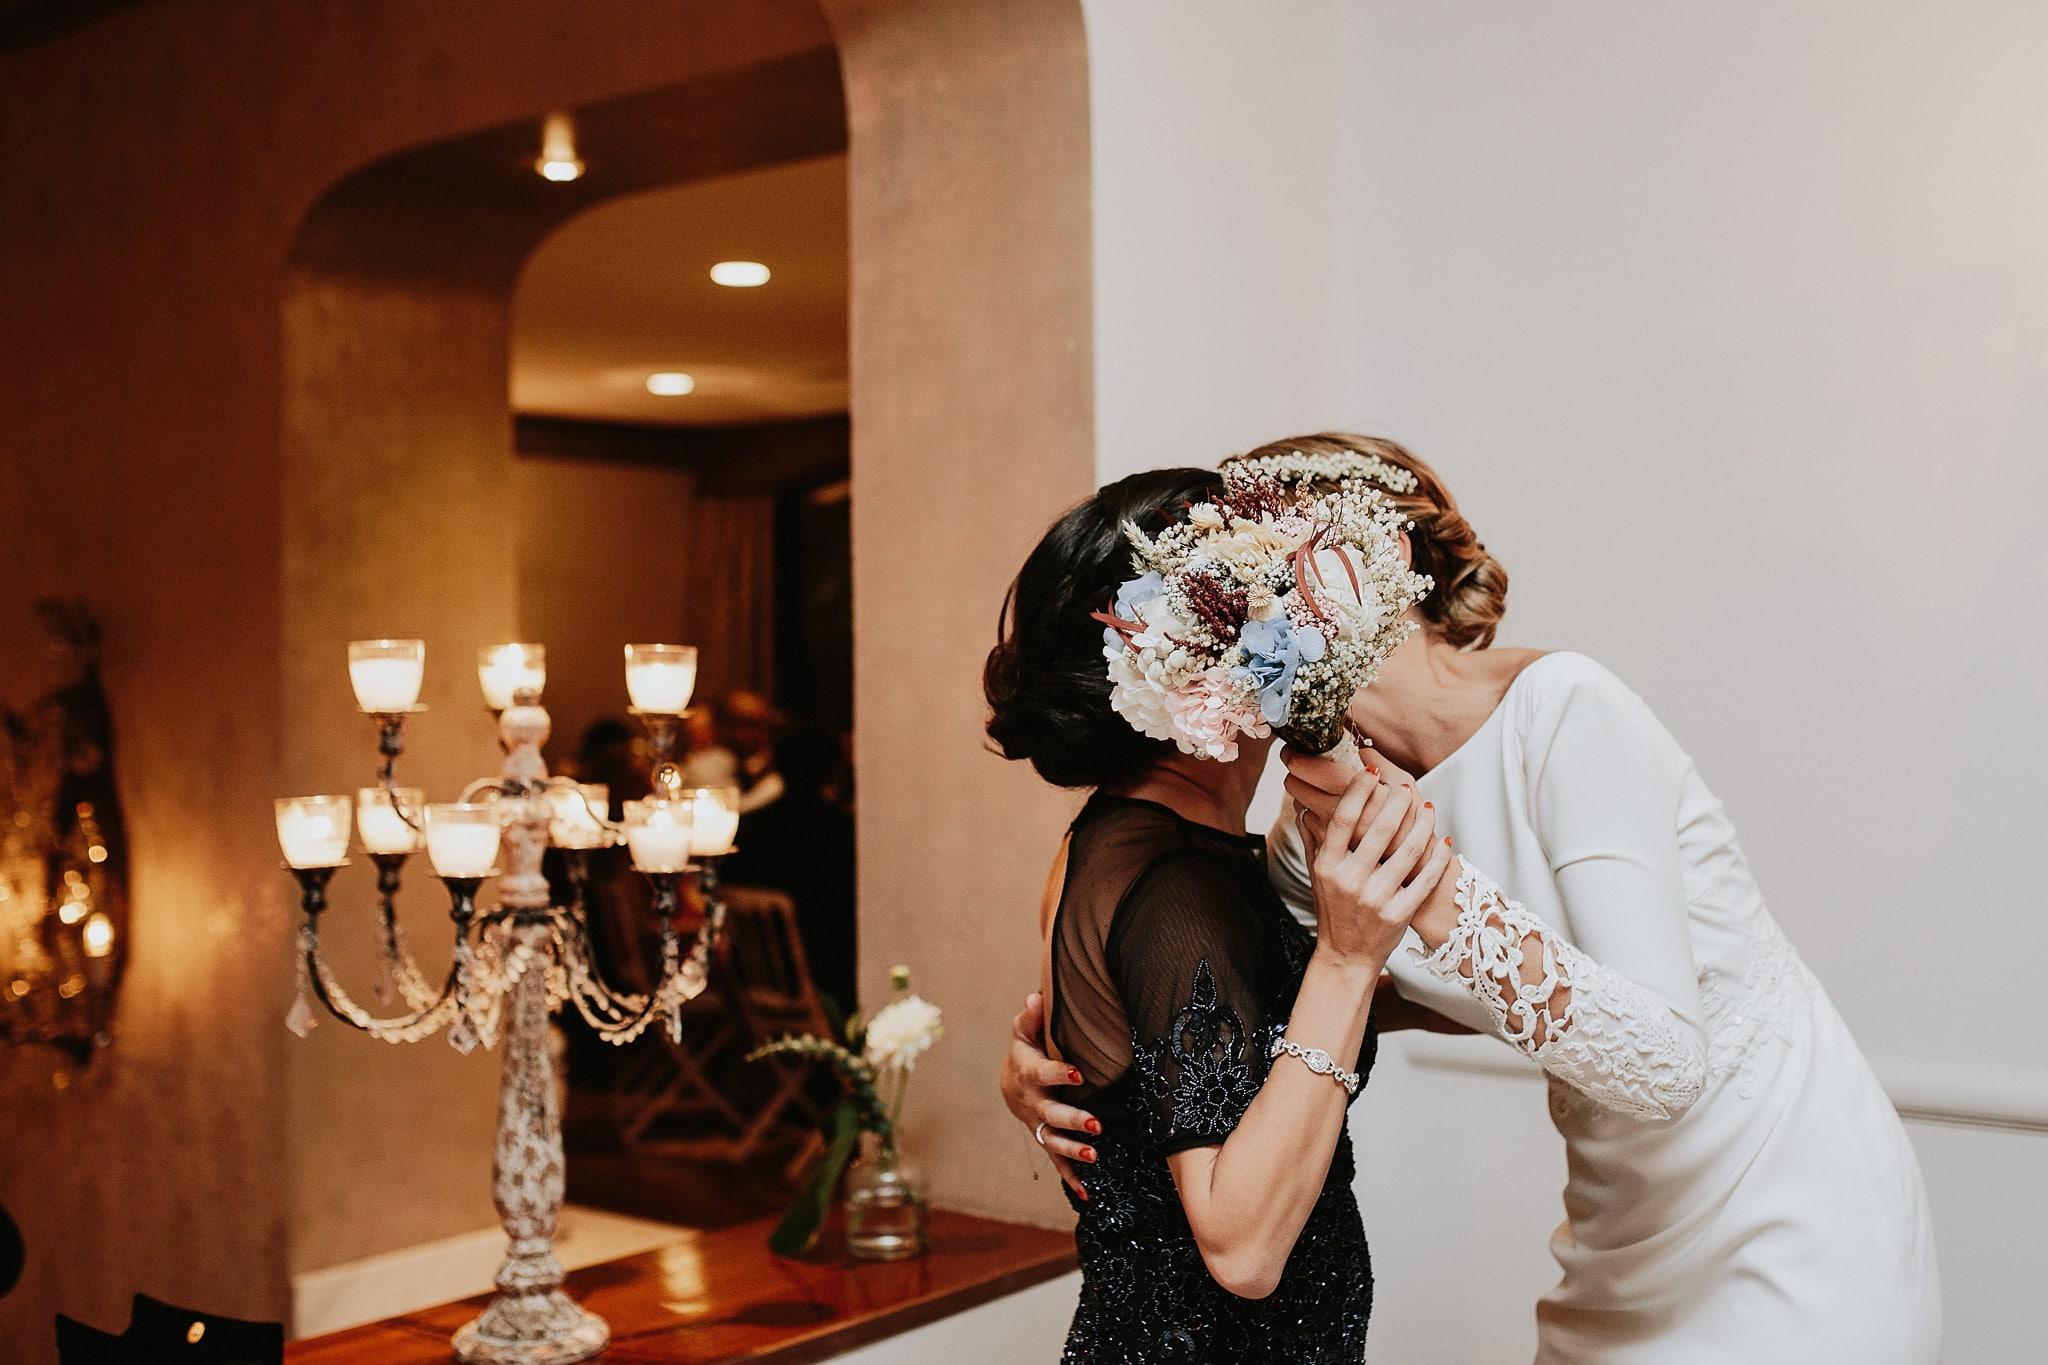 prisma-blanco-fotografos-bodas-toledo-163